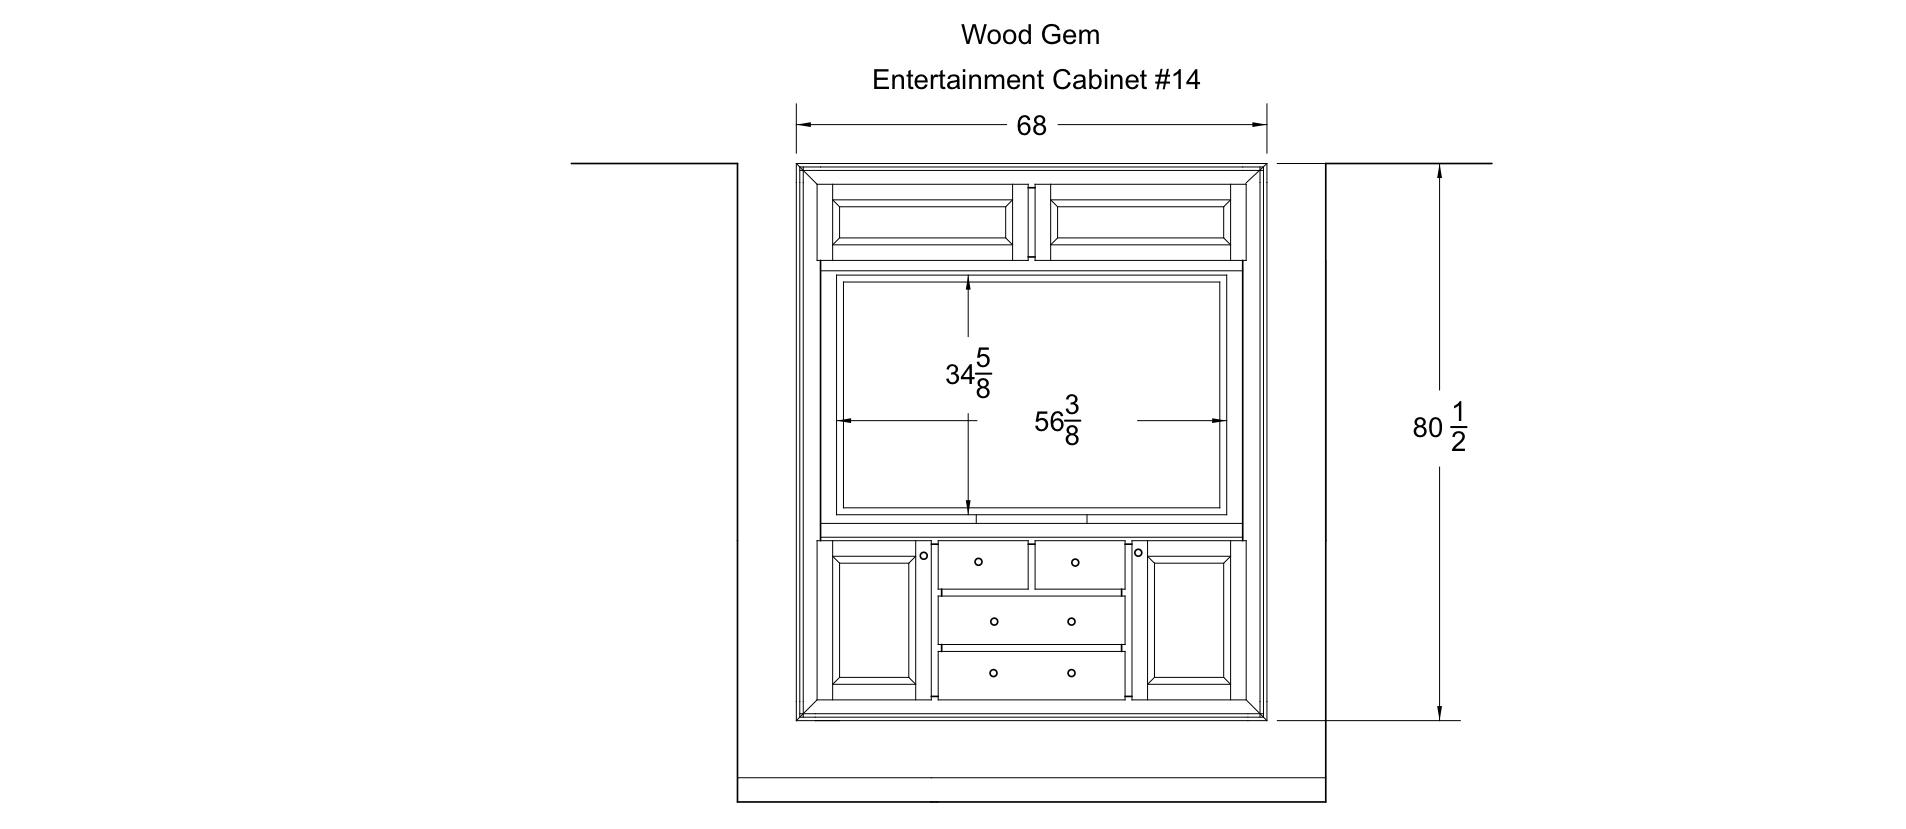 Entertainment cabinet #14.png